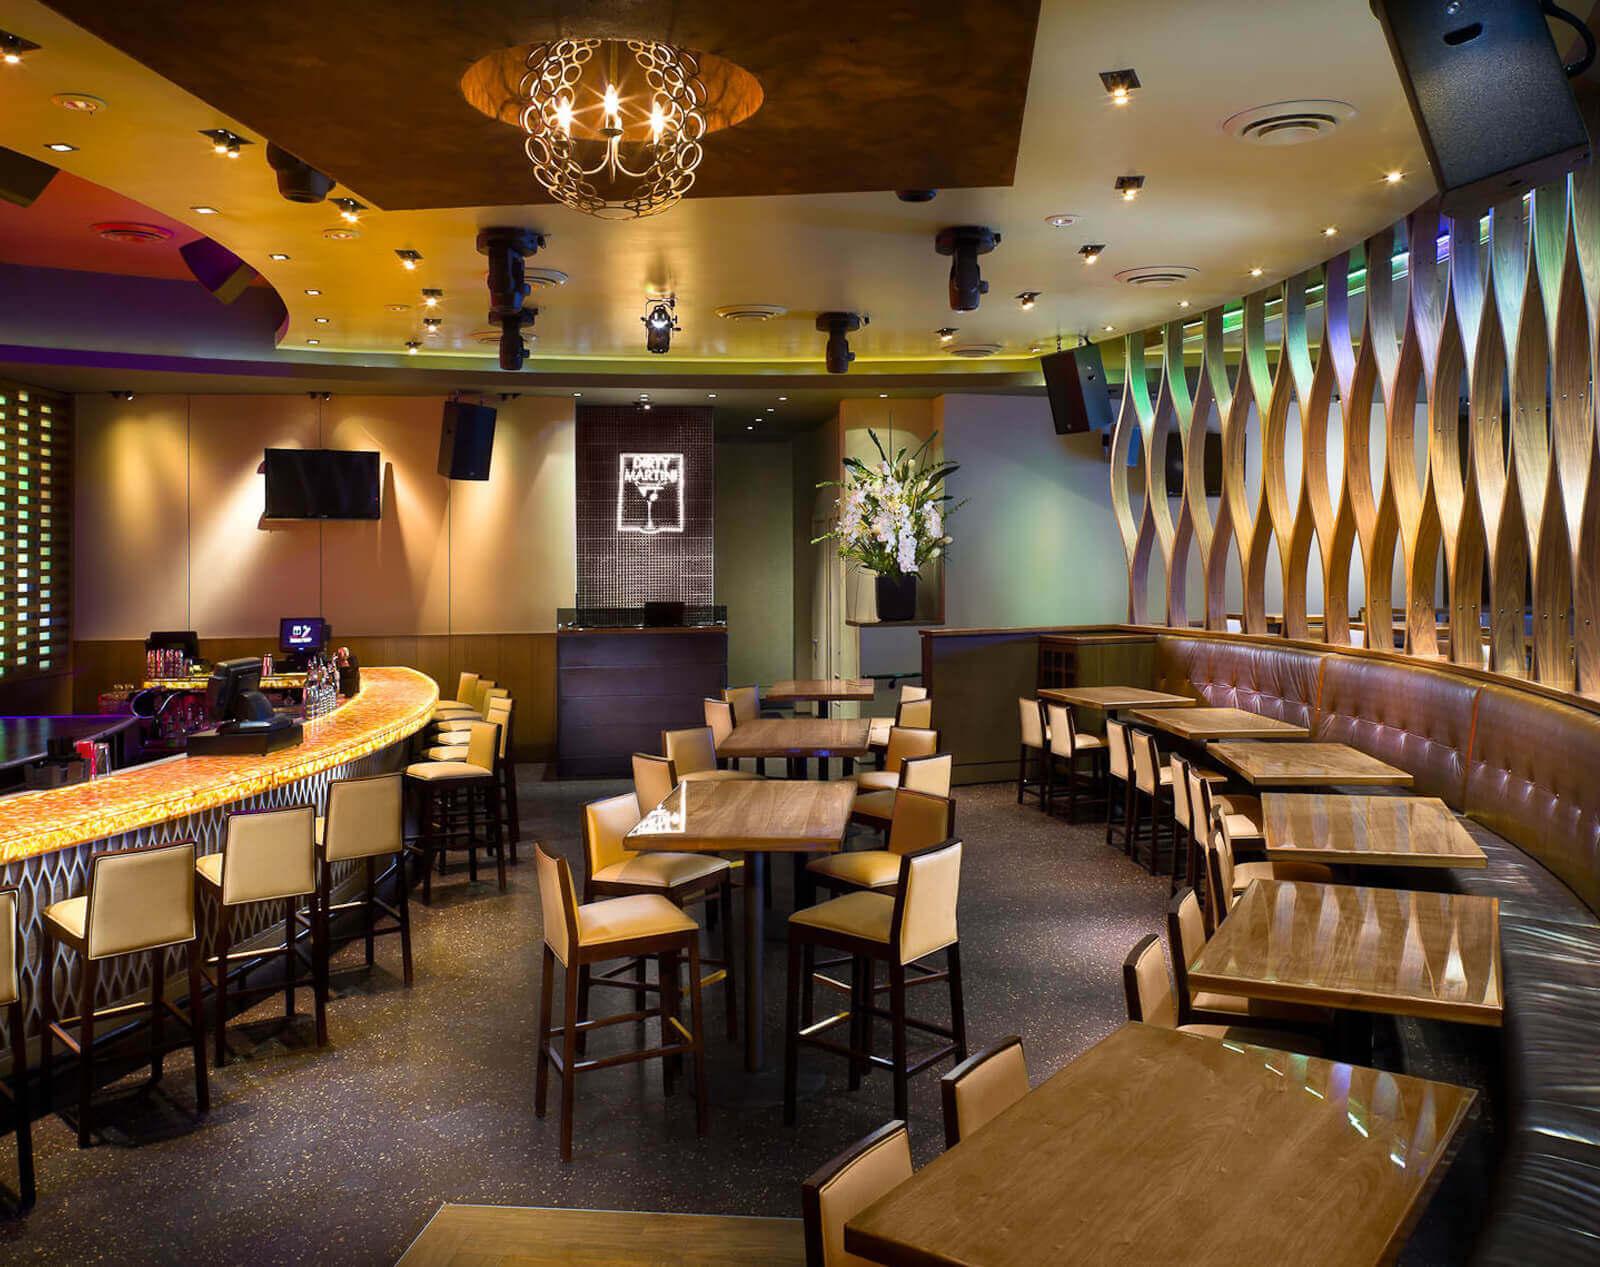 Commercial Conference interior design Ideas